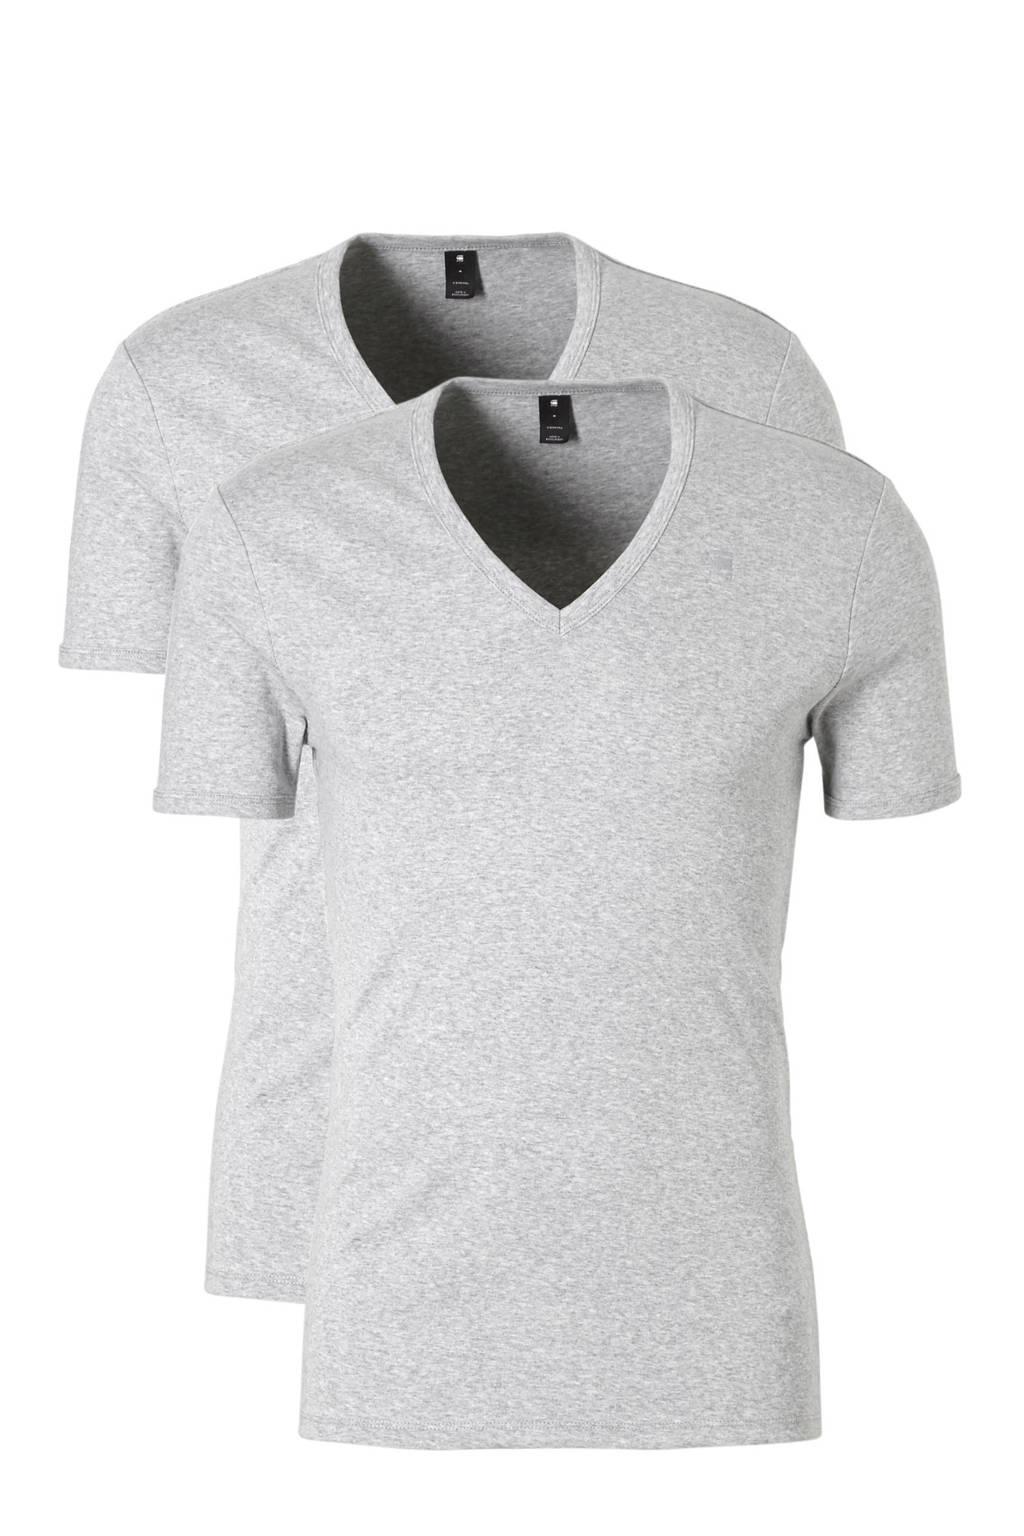 G-Star RAW Base T-shirt (set van 2), Grijs